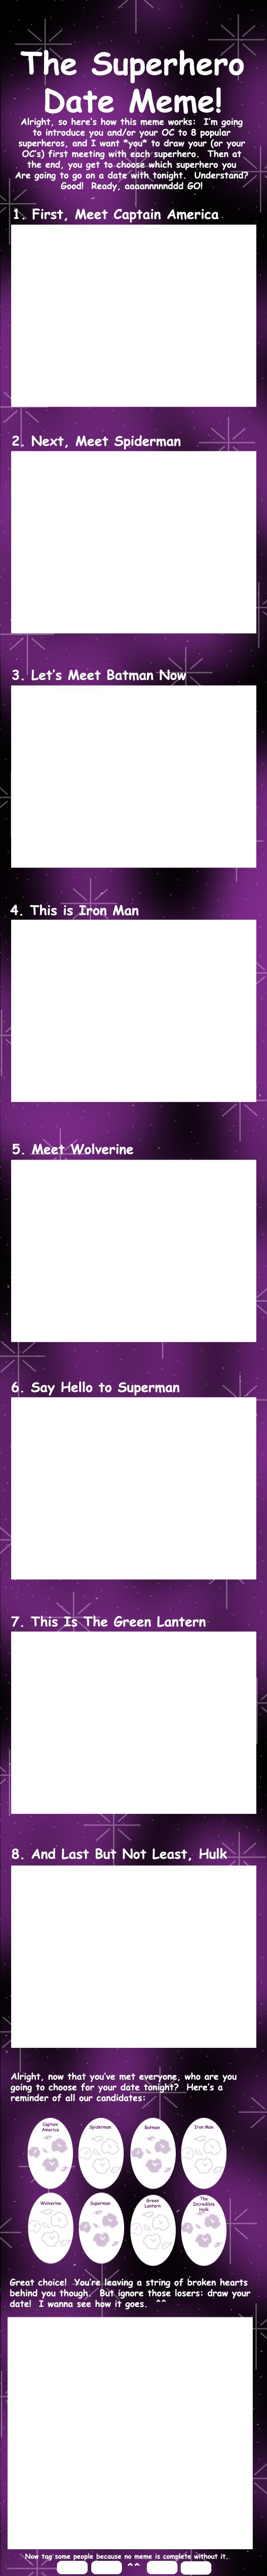 Superhero Speed Date Meme by FlirtingWithInsanity